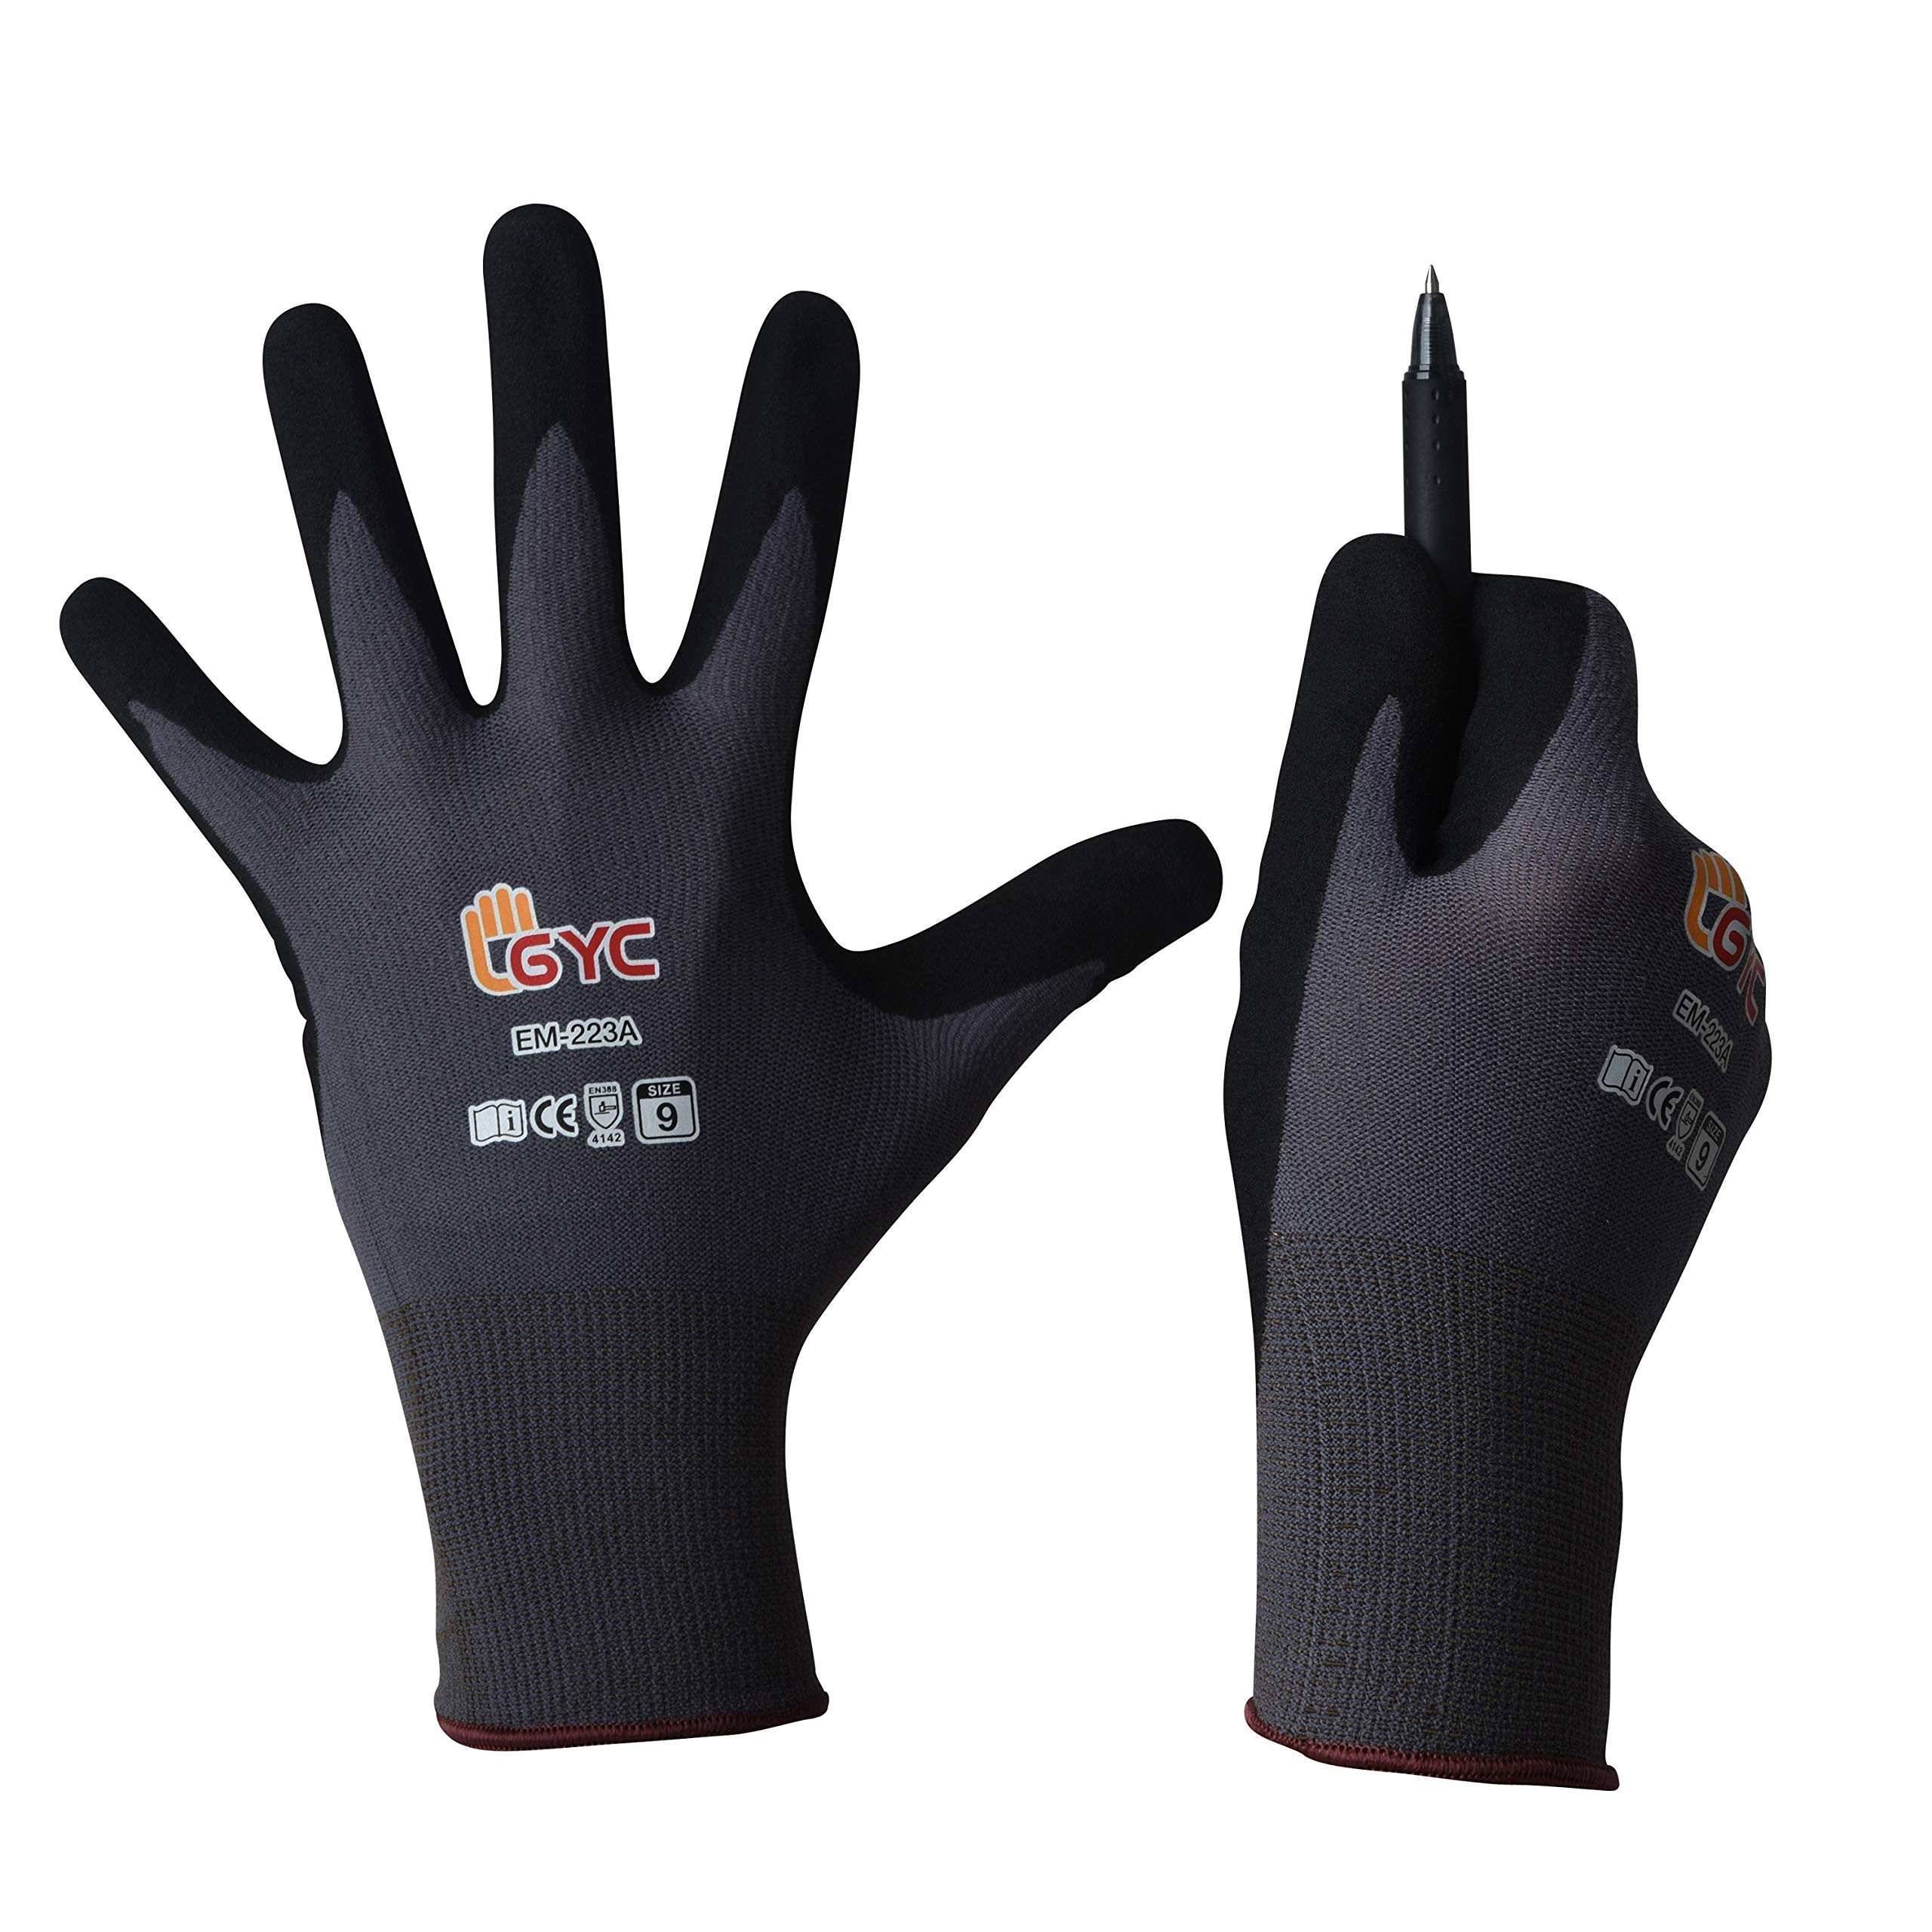 GYC Gloves, DIY Gardening, Food Grade ECO PU Coated Safety Work Gloves - 10 Pairs Pack - General Work Glove, Comfortable Grip, Anti-Slip (EM-223A / SIZE 8 - Medium, 10 Pairs) by SHINSUNG MAJOR GLOVE